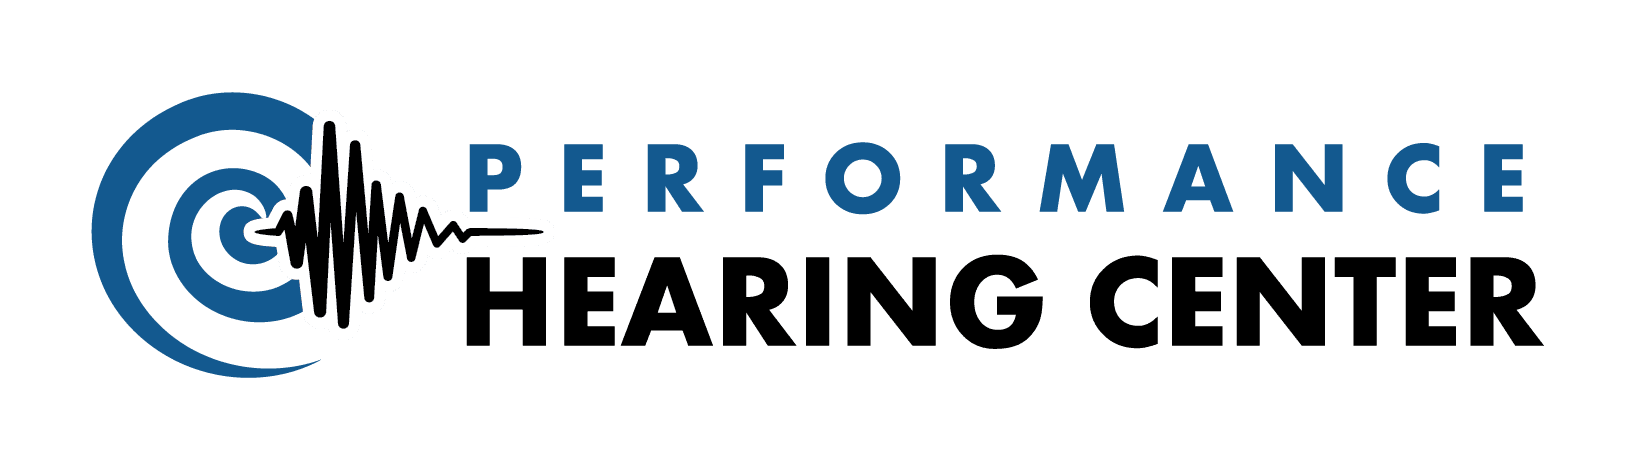 Performance Hearing Center